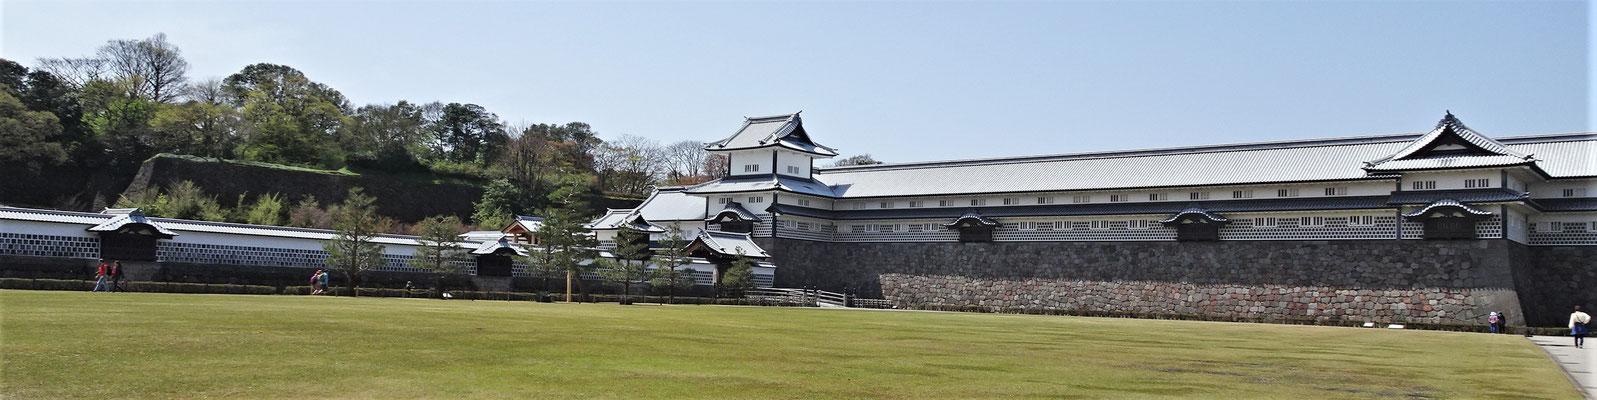 Die Burg Kanazawa.....